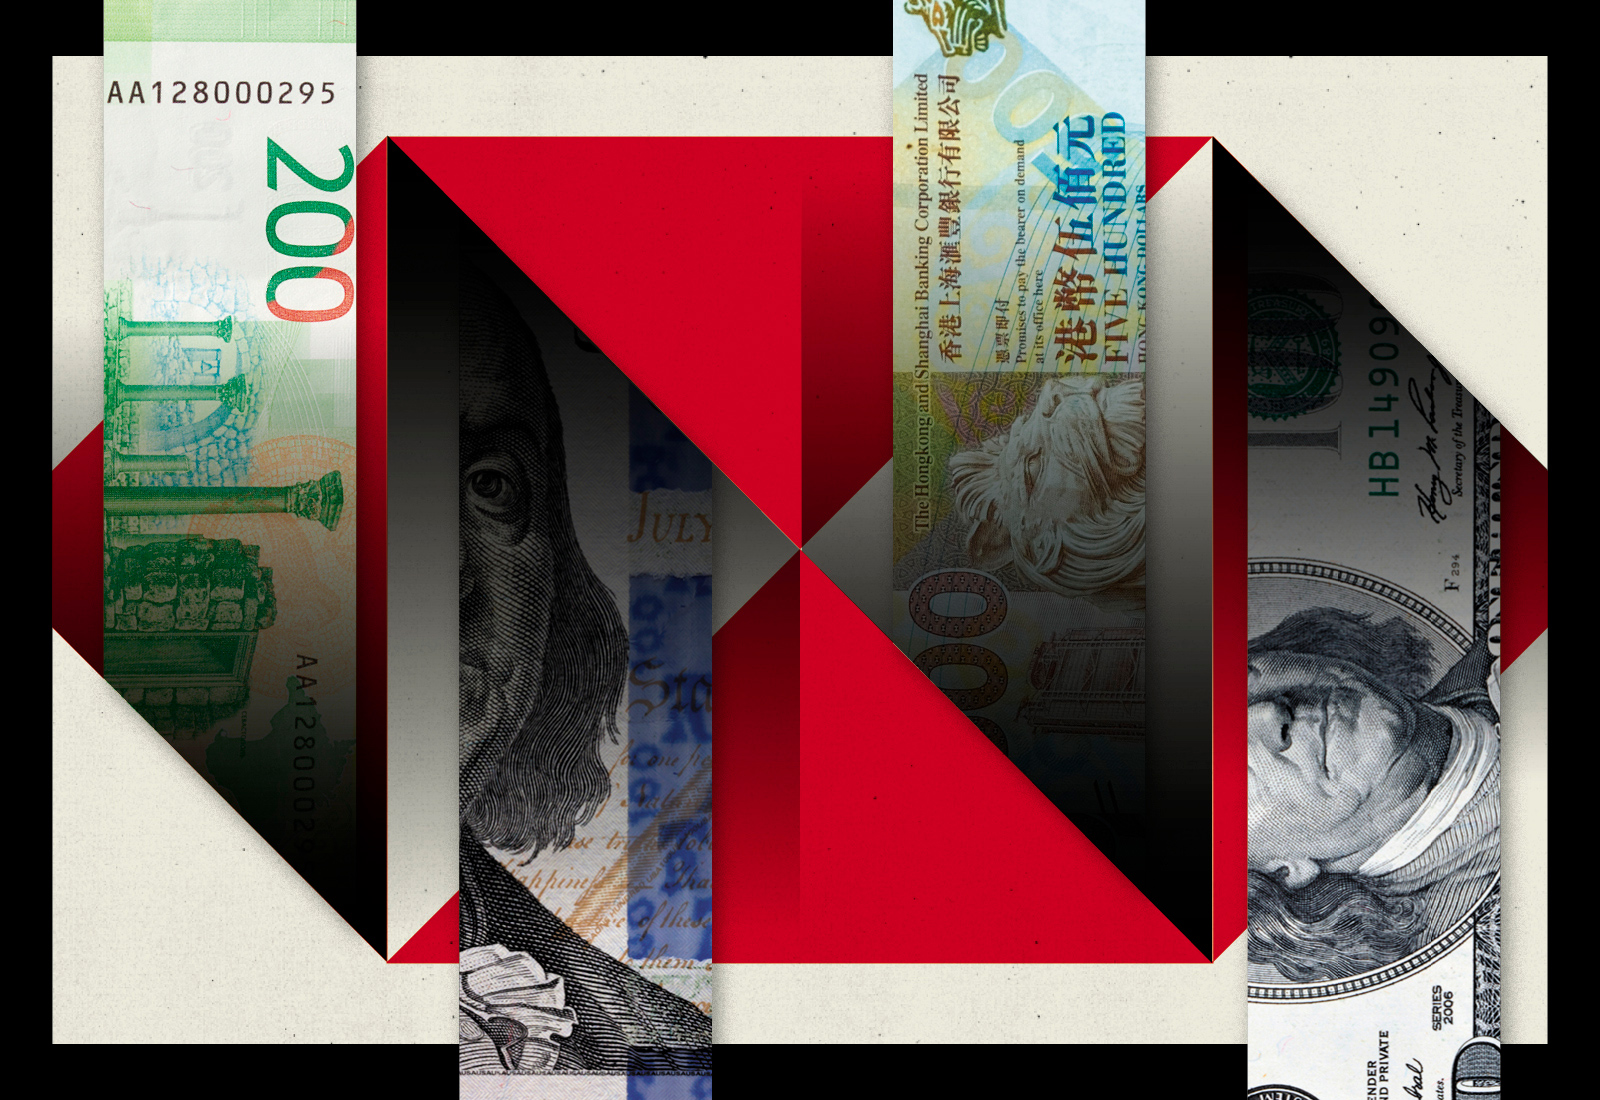 HSBC colaboró en una masiva estafa Ponzi